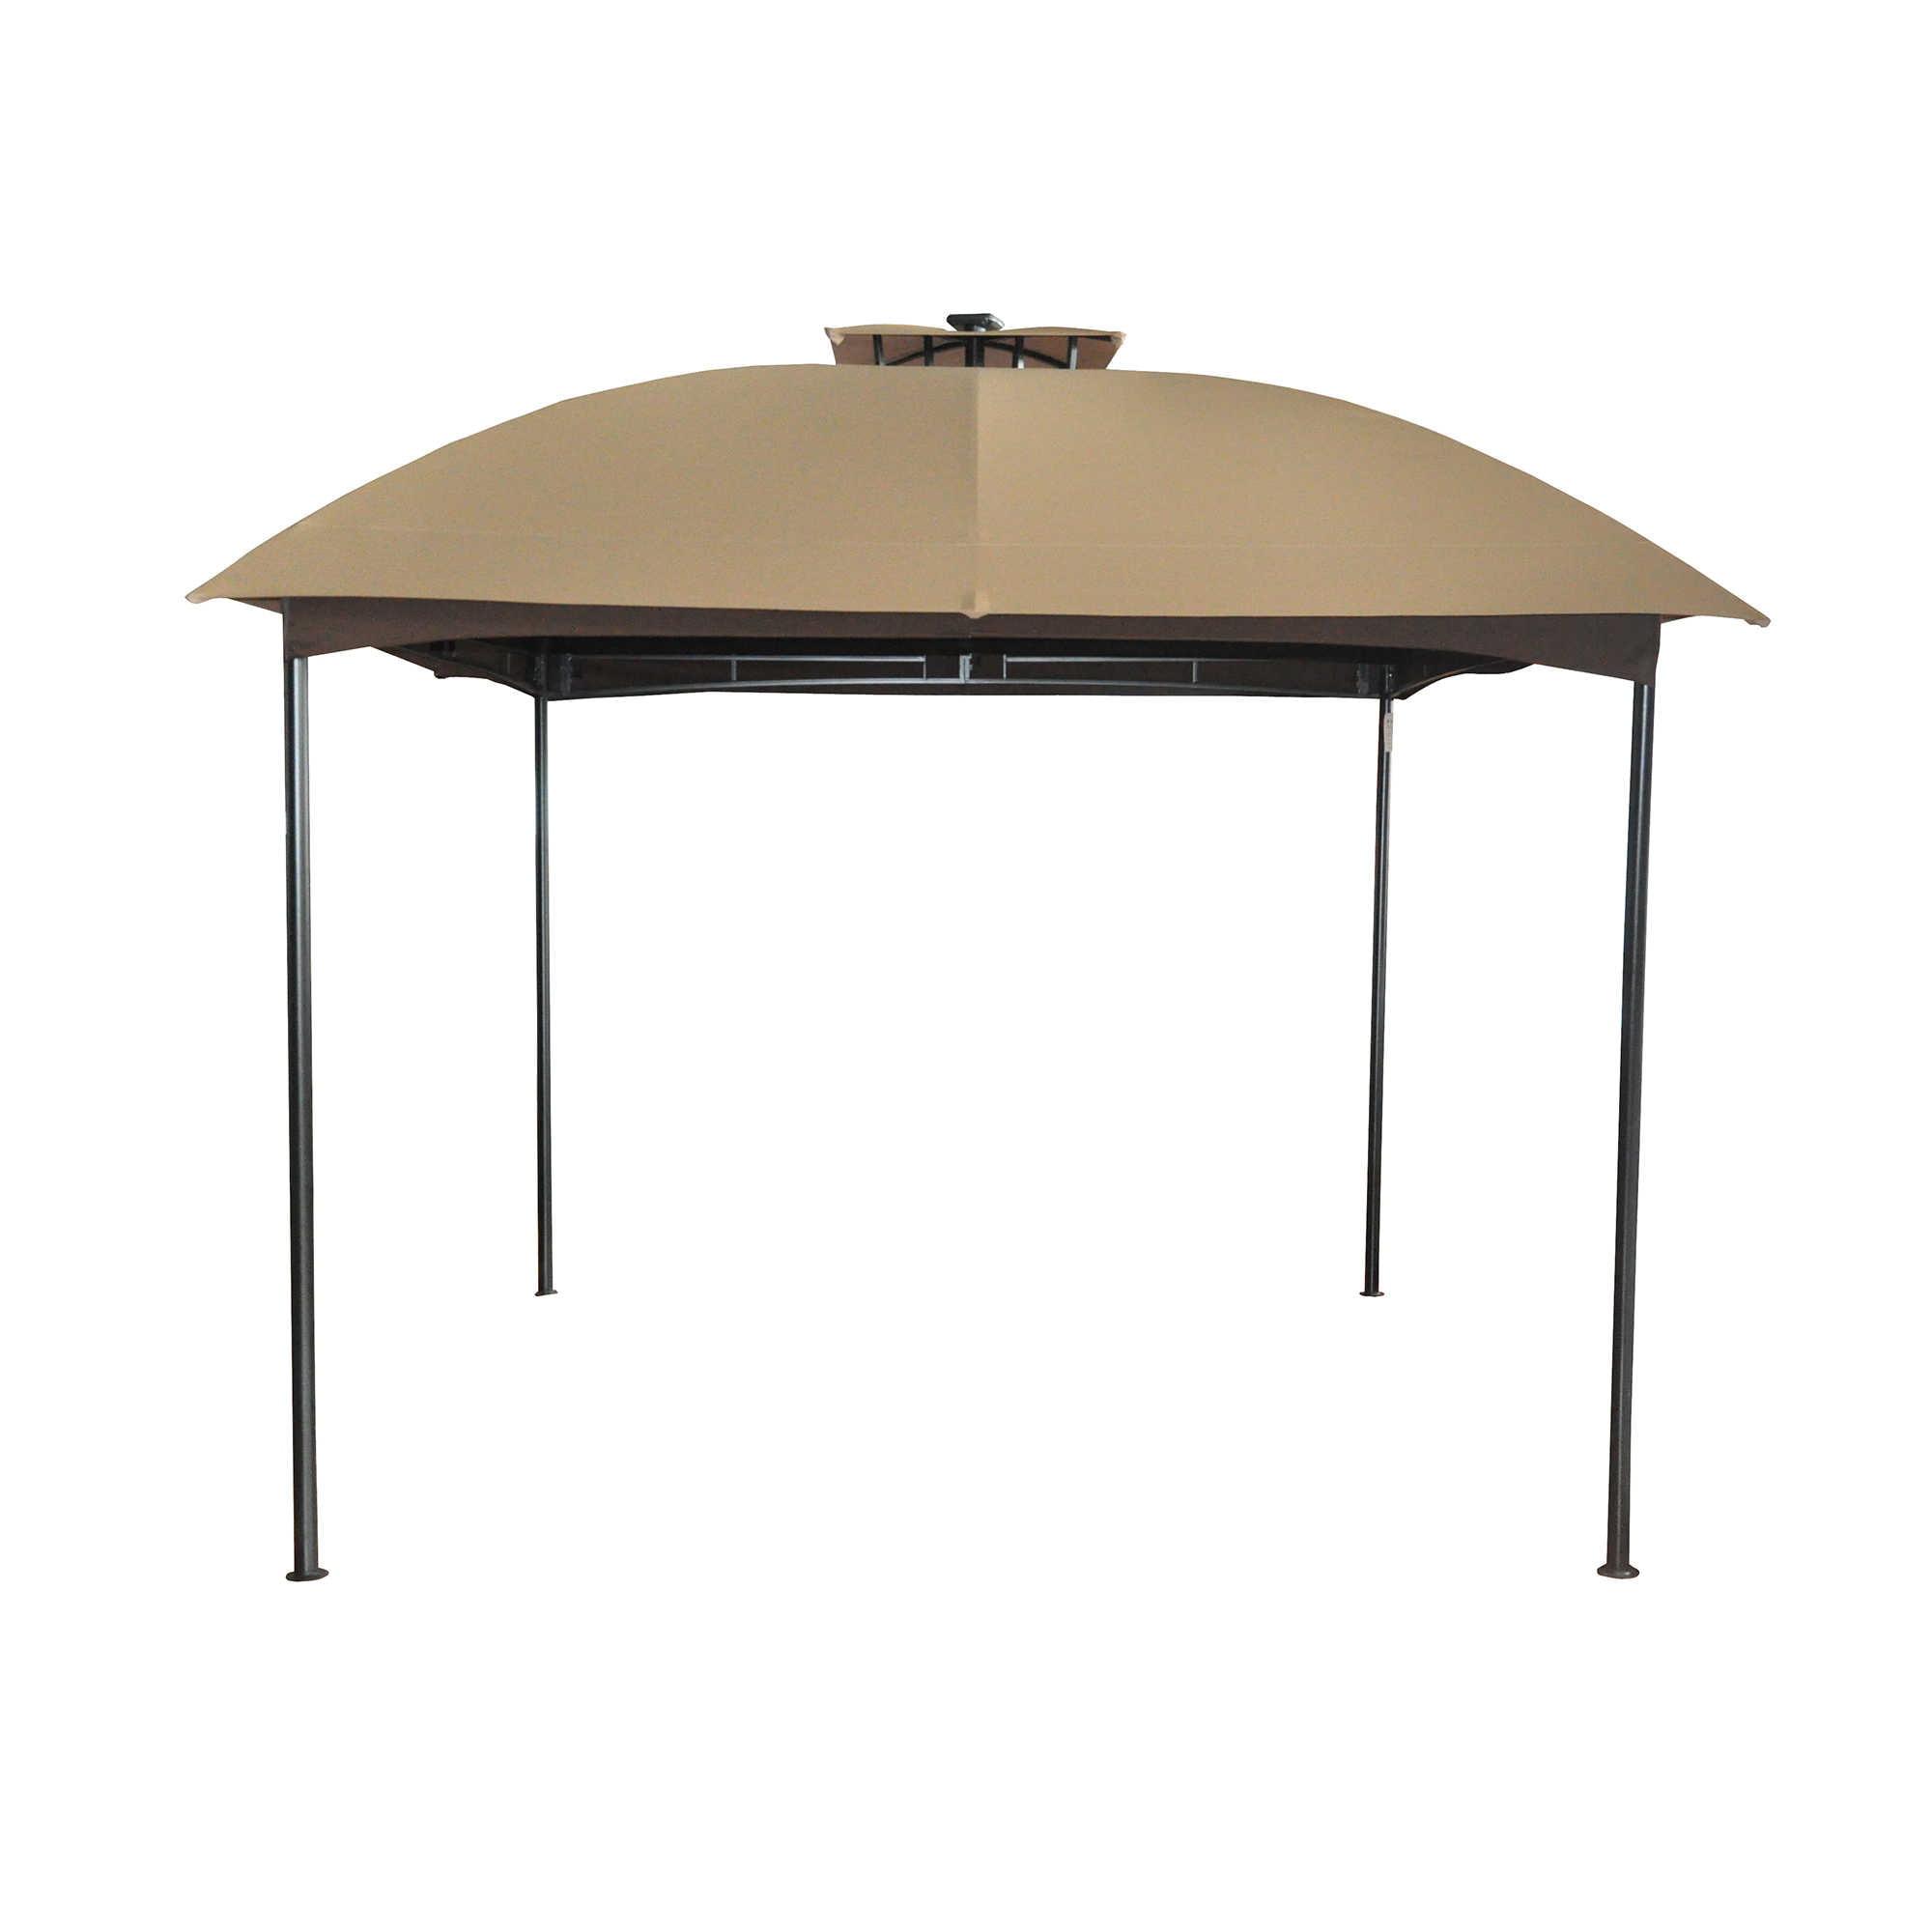 Admirable Garden Winds Replacement Canopy For The Bbb Solar Gazebo Riplock 350 Walmart Com Ibusinesslaw Wood Chair Design Ideas Ibusinesslaworg